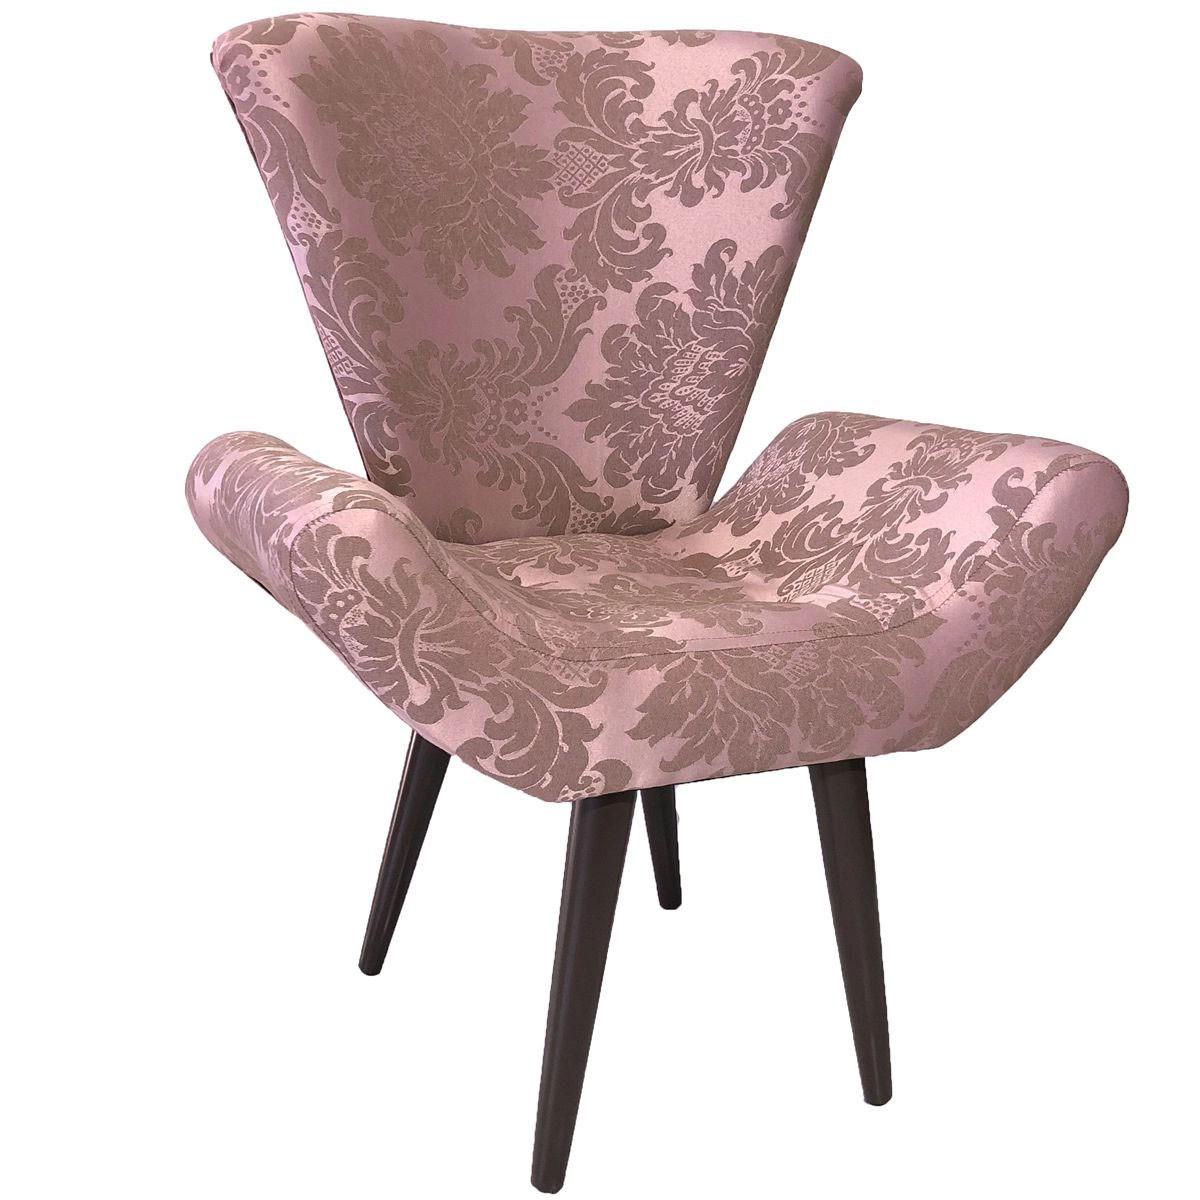 Poltrona Decorativa Elegance Jacquard Luxo Rosê Gold